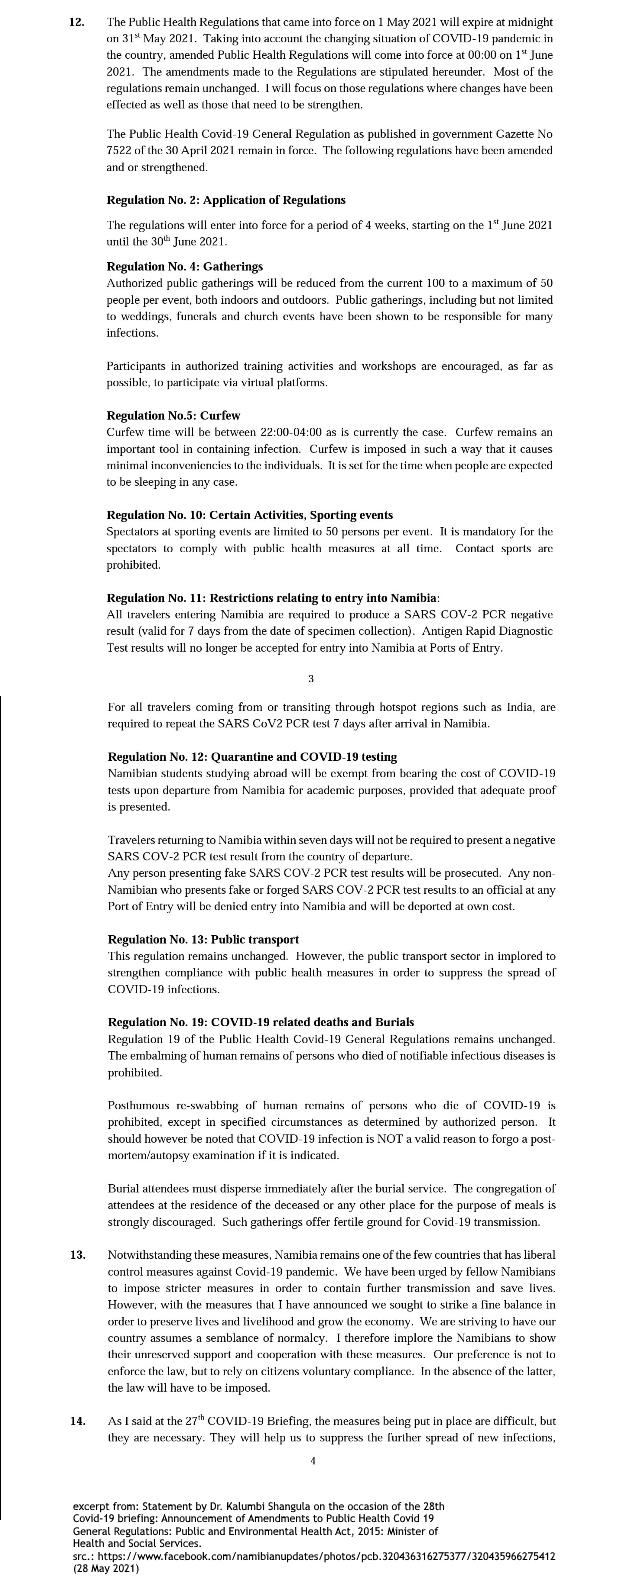 Namibia_Covid19_regulations_June_2021